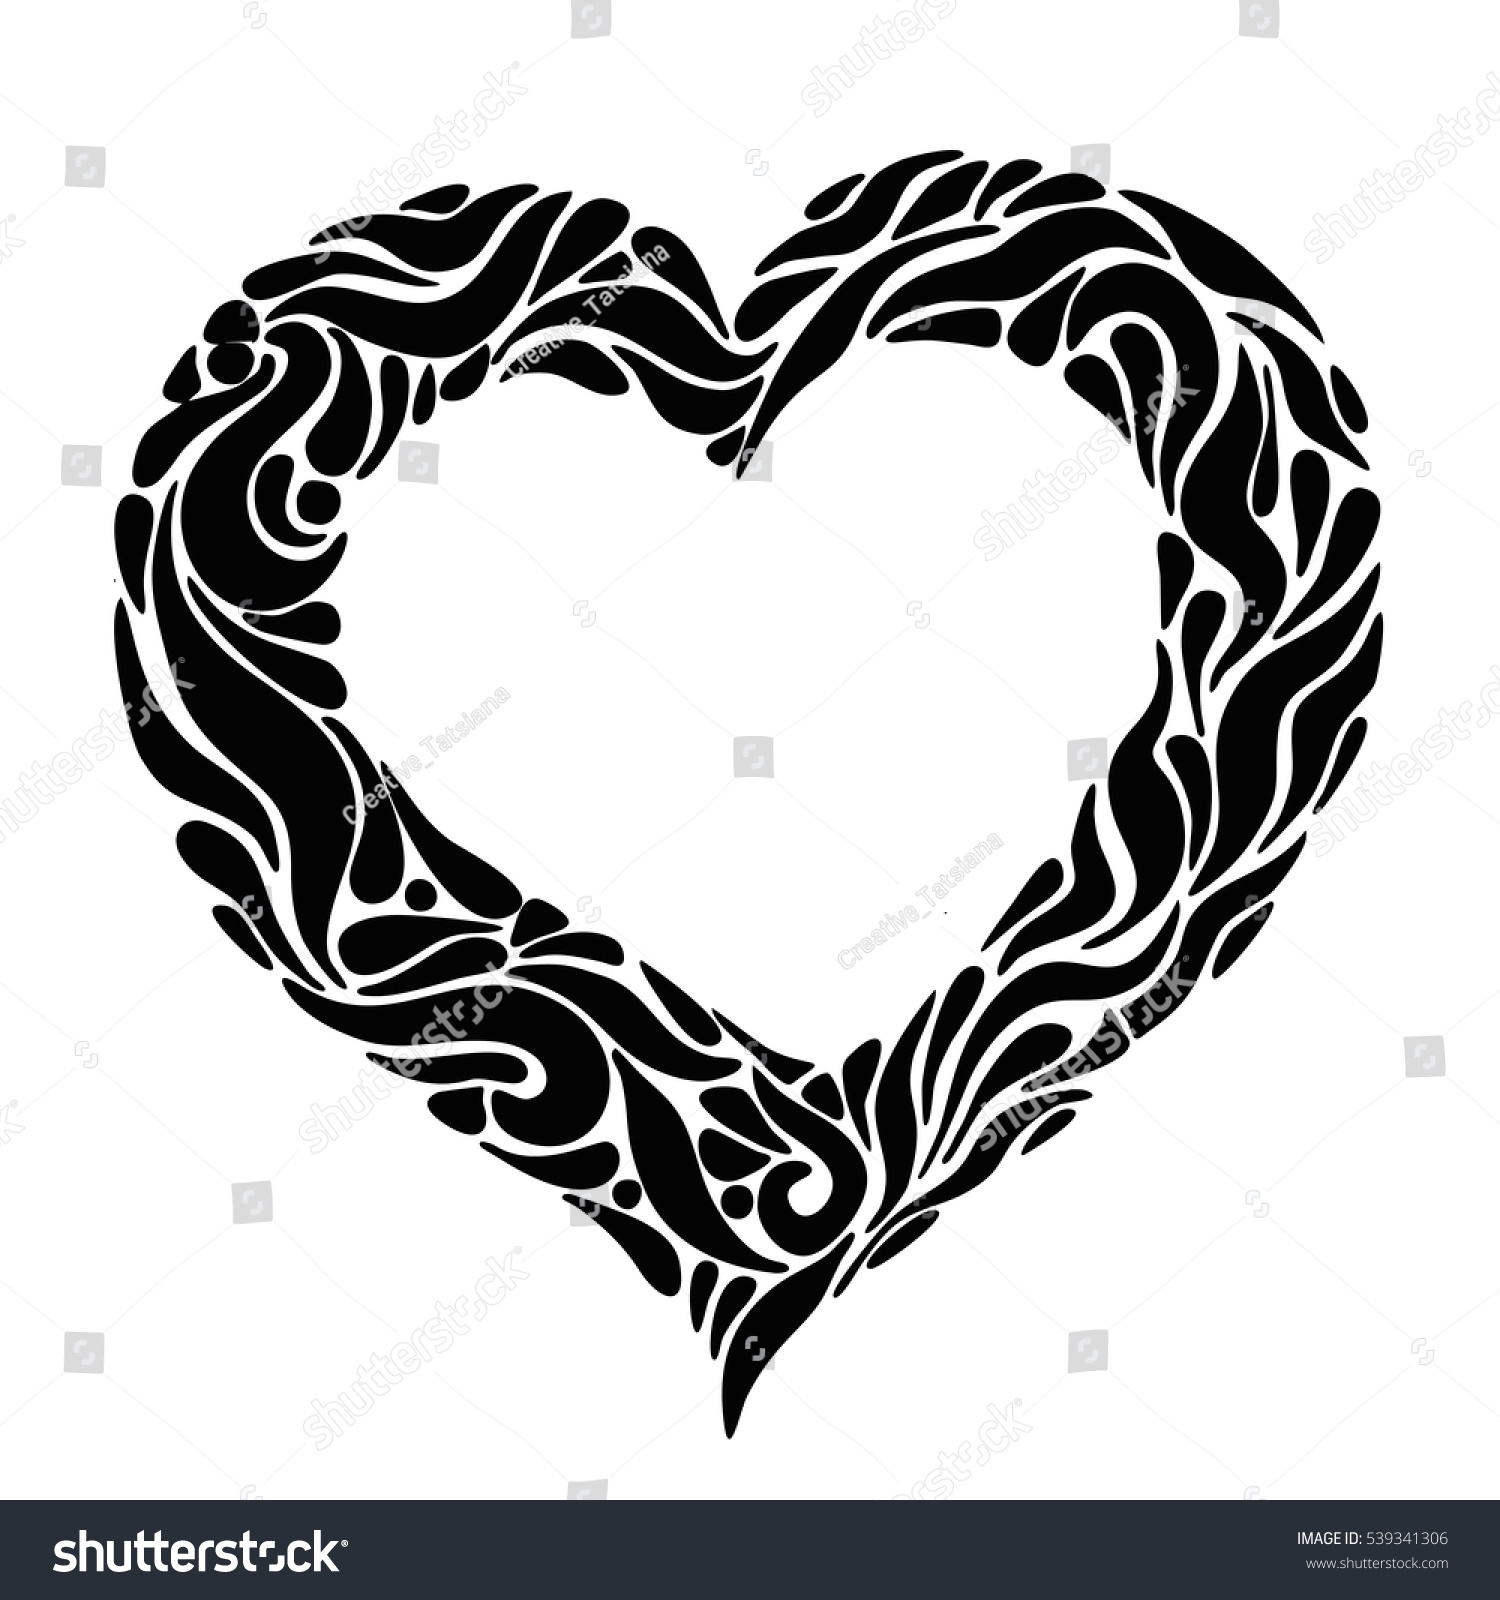 Elegant Ornate Black Heart Symbol Love Stock Illustration Royalty